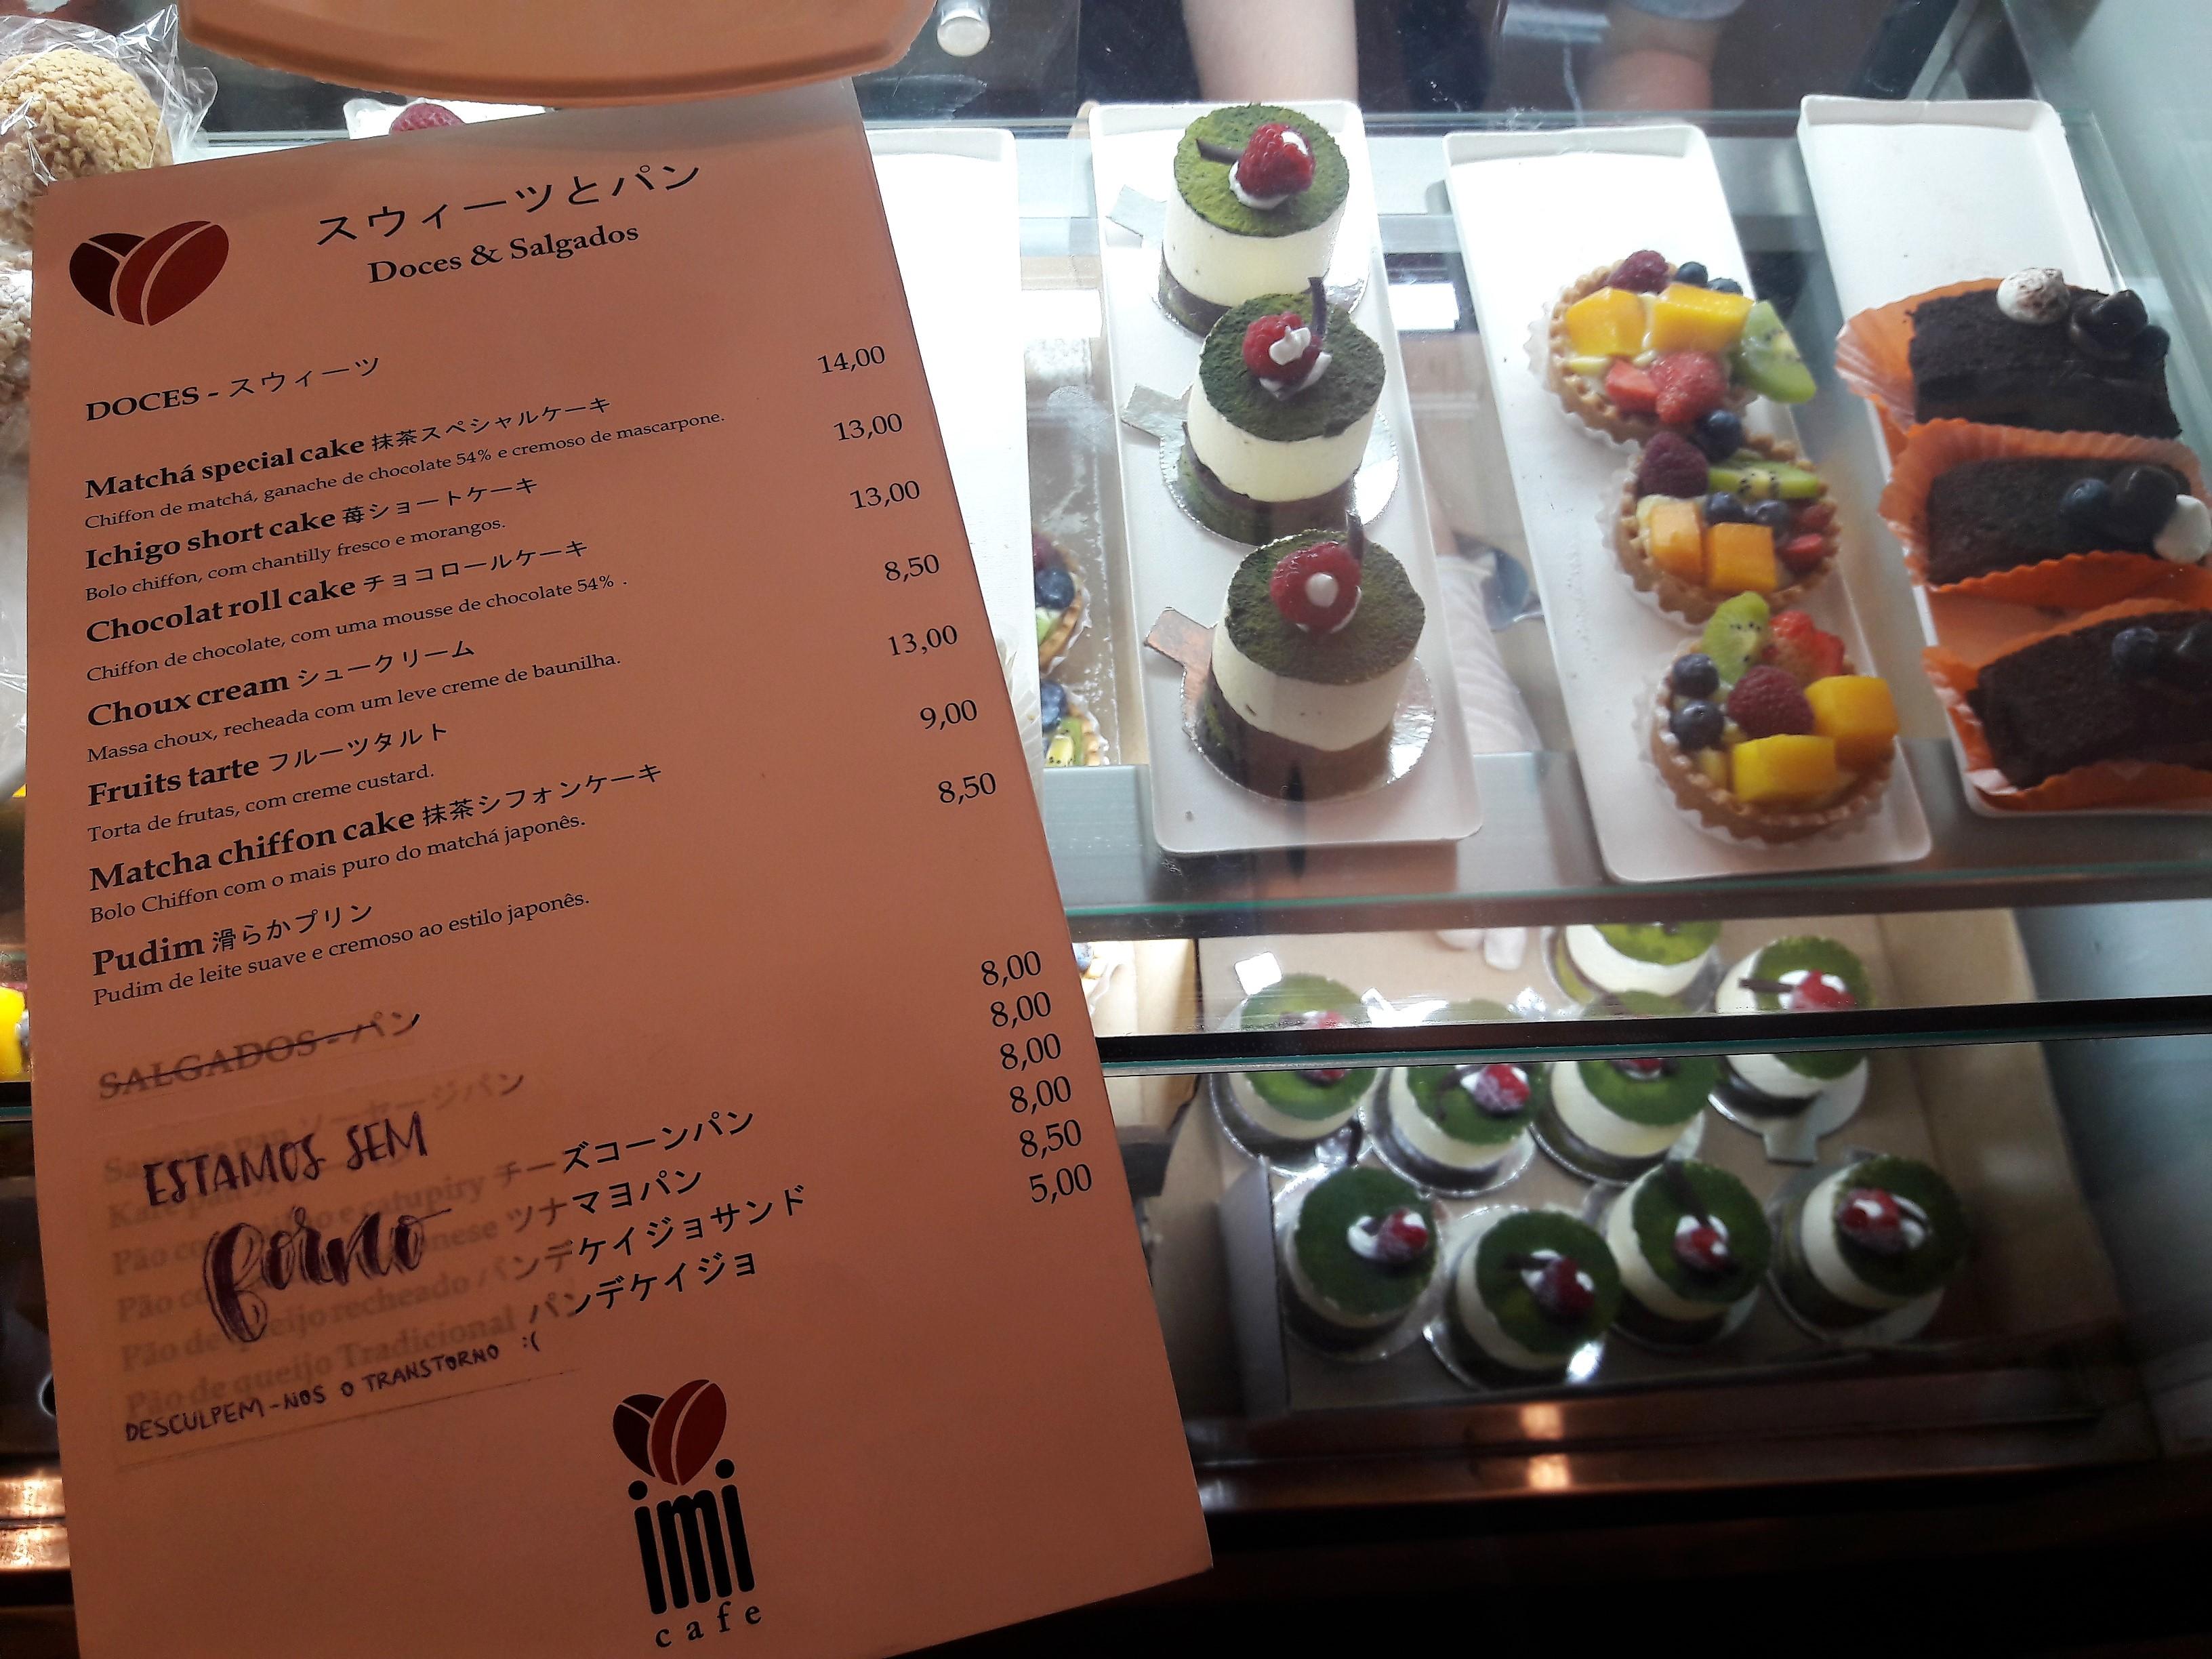 Japan House restaurante